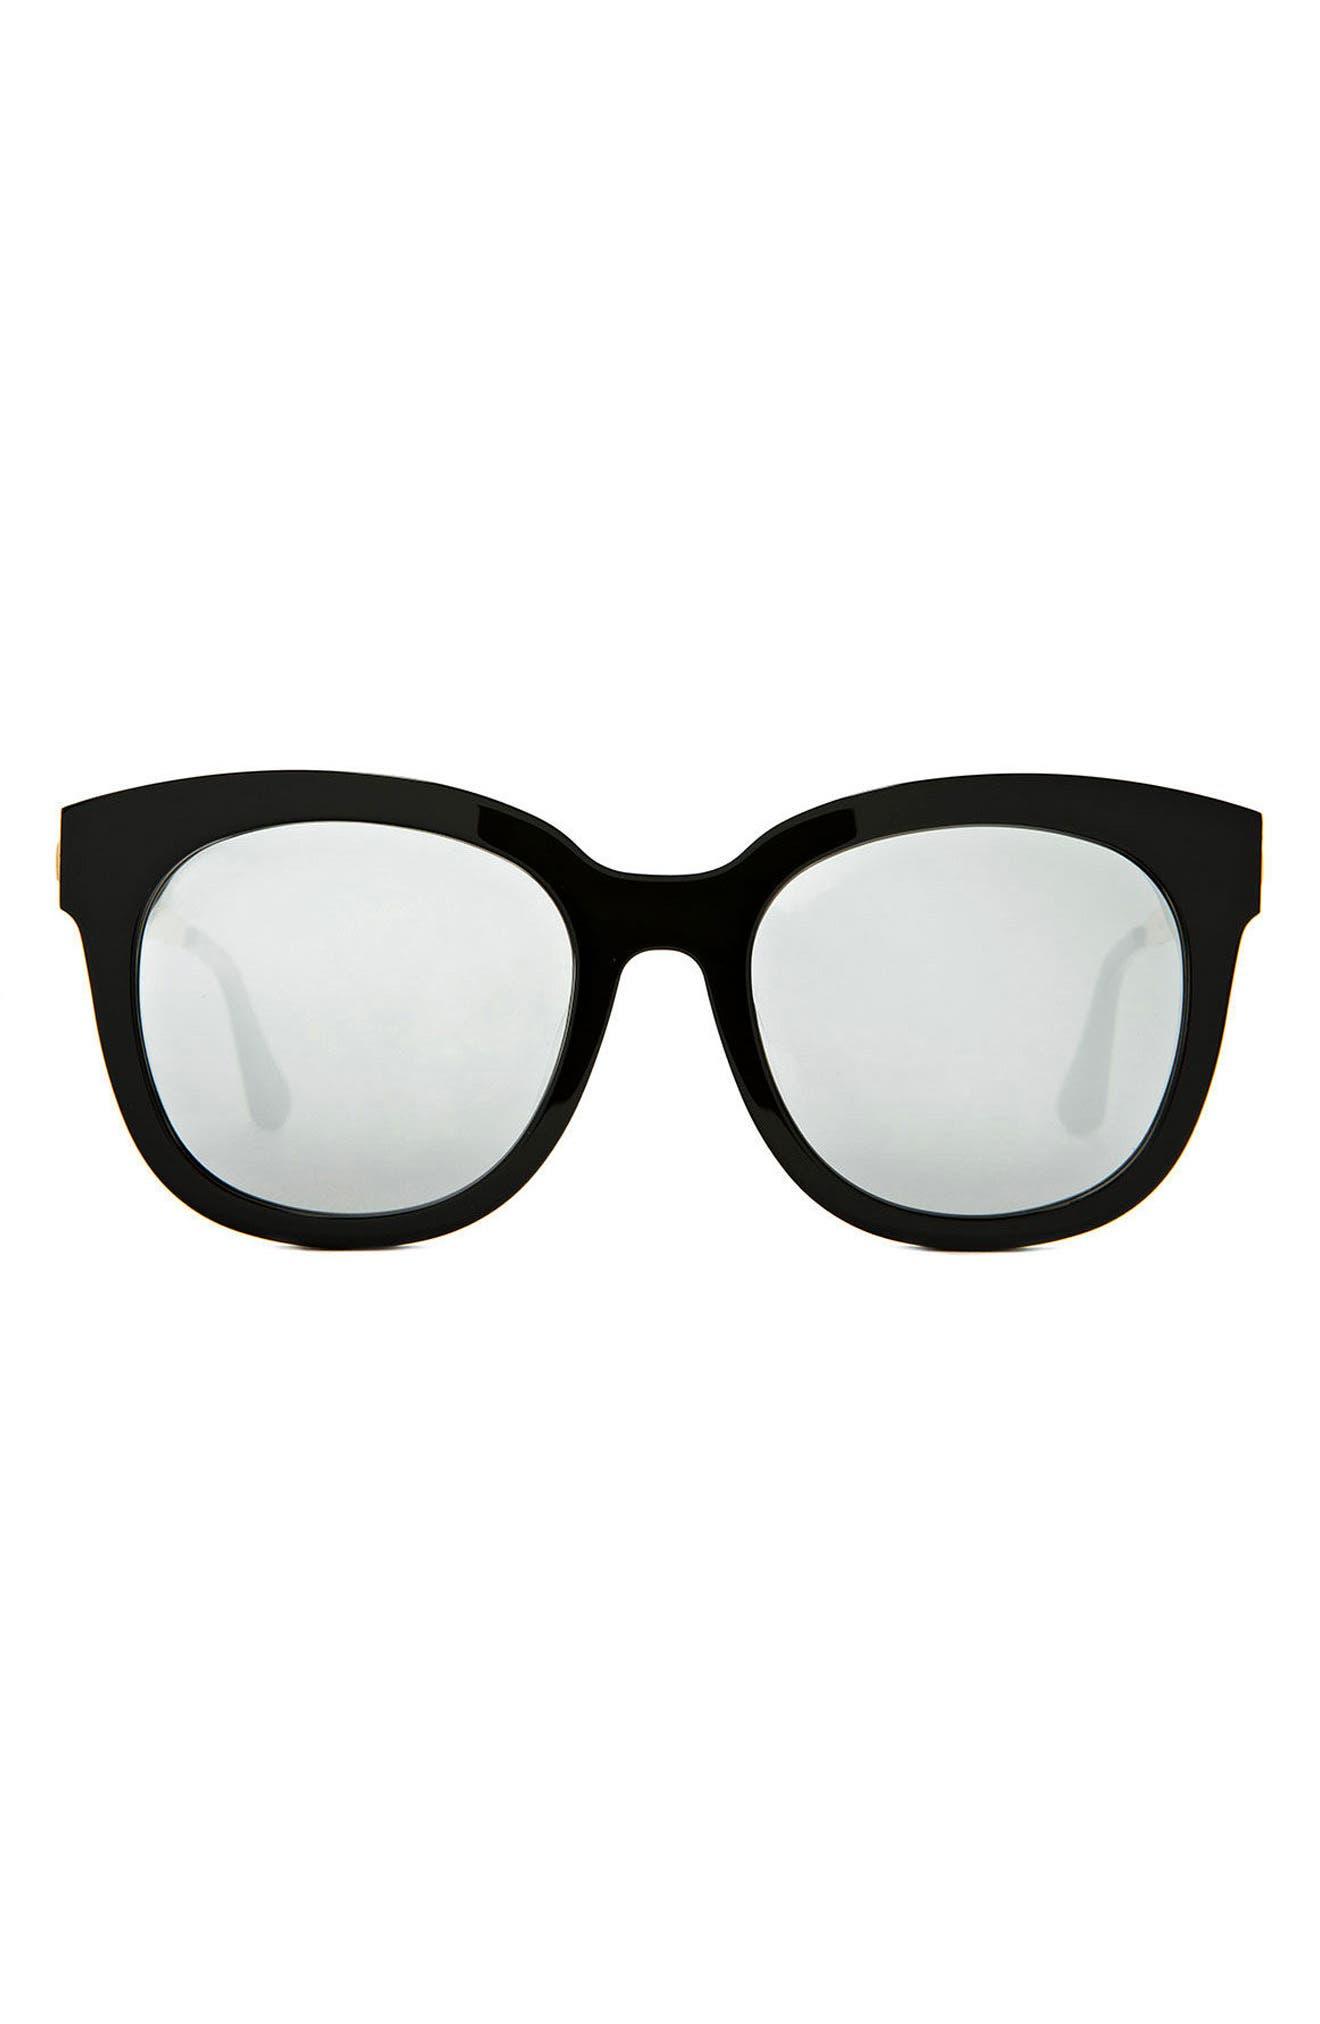 Cuba 55mm Sunglasses,                         Main,                         color, Black/Silver